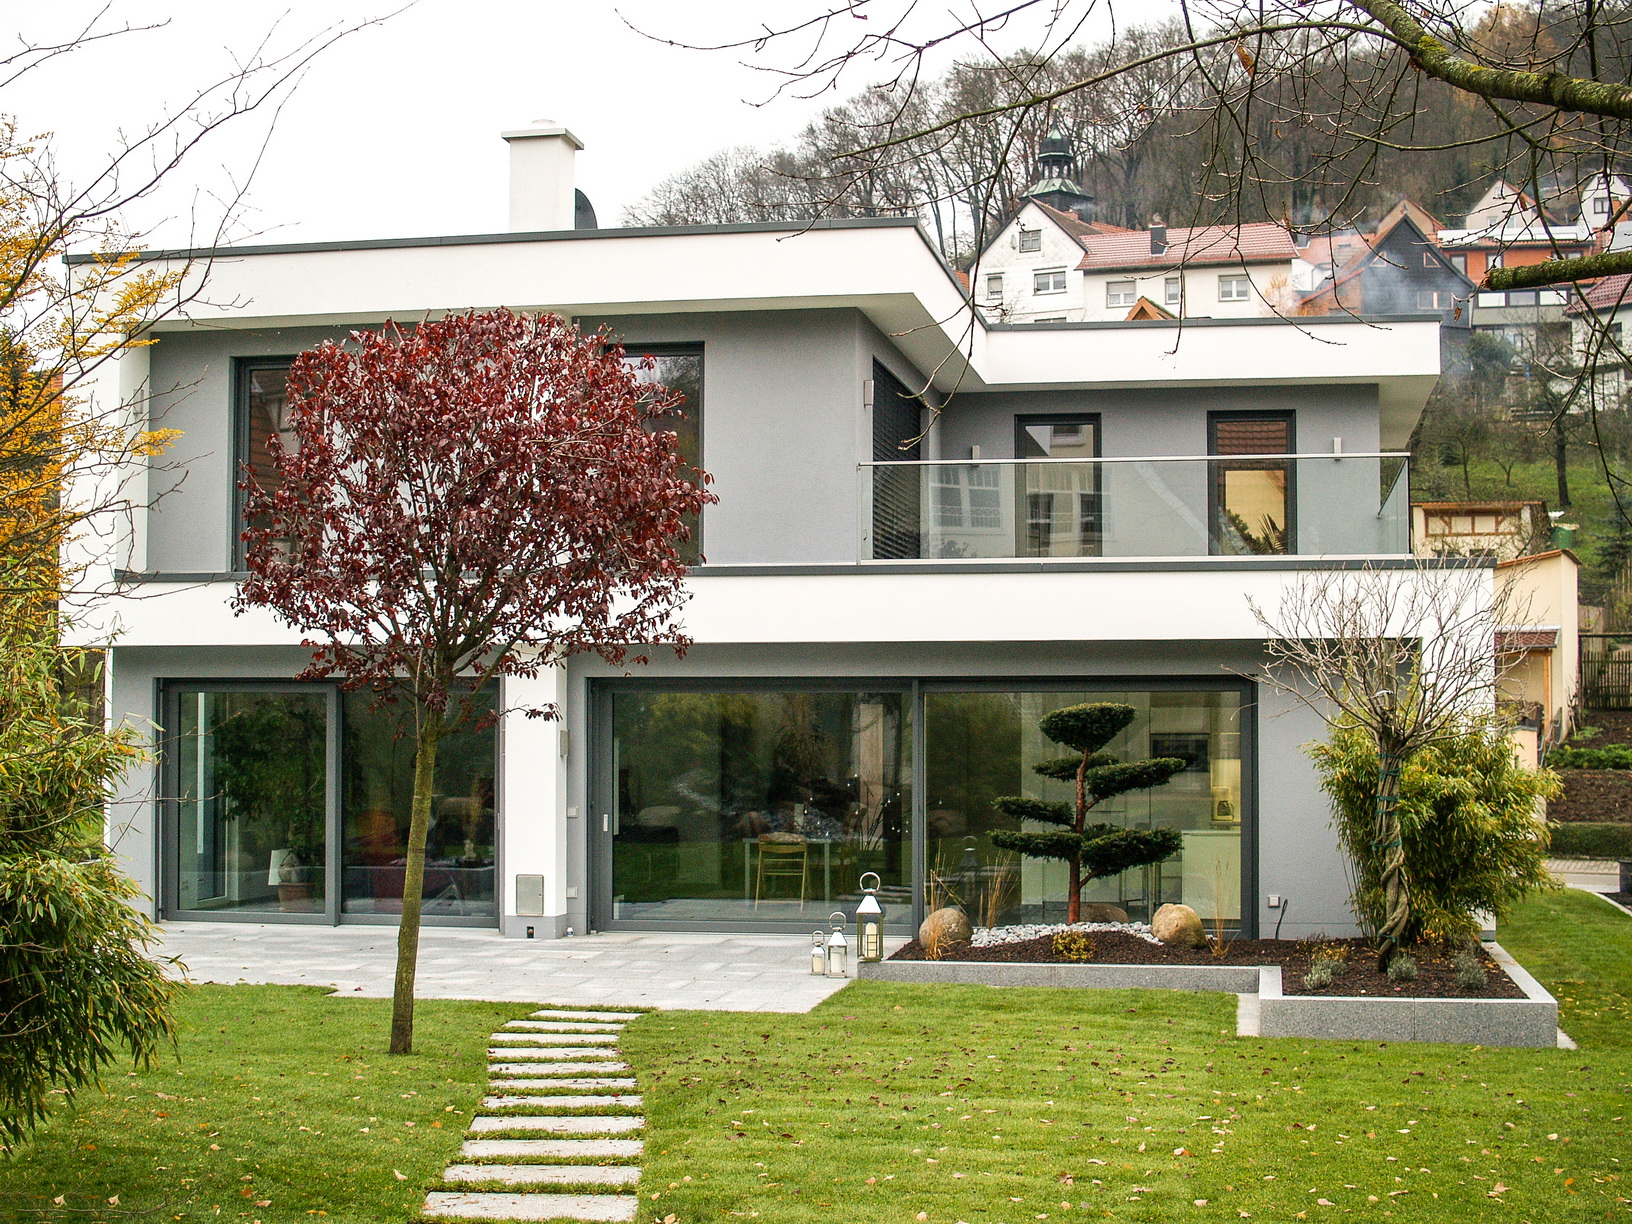 Neubau einfamilienhaus peterseim fertiggestellt egn for Neubau einfamilienhaus